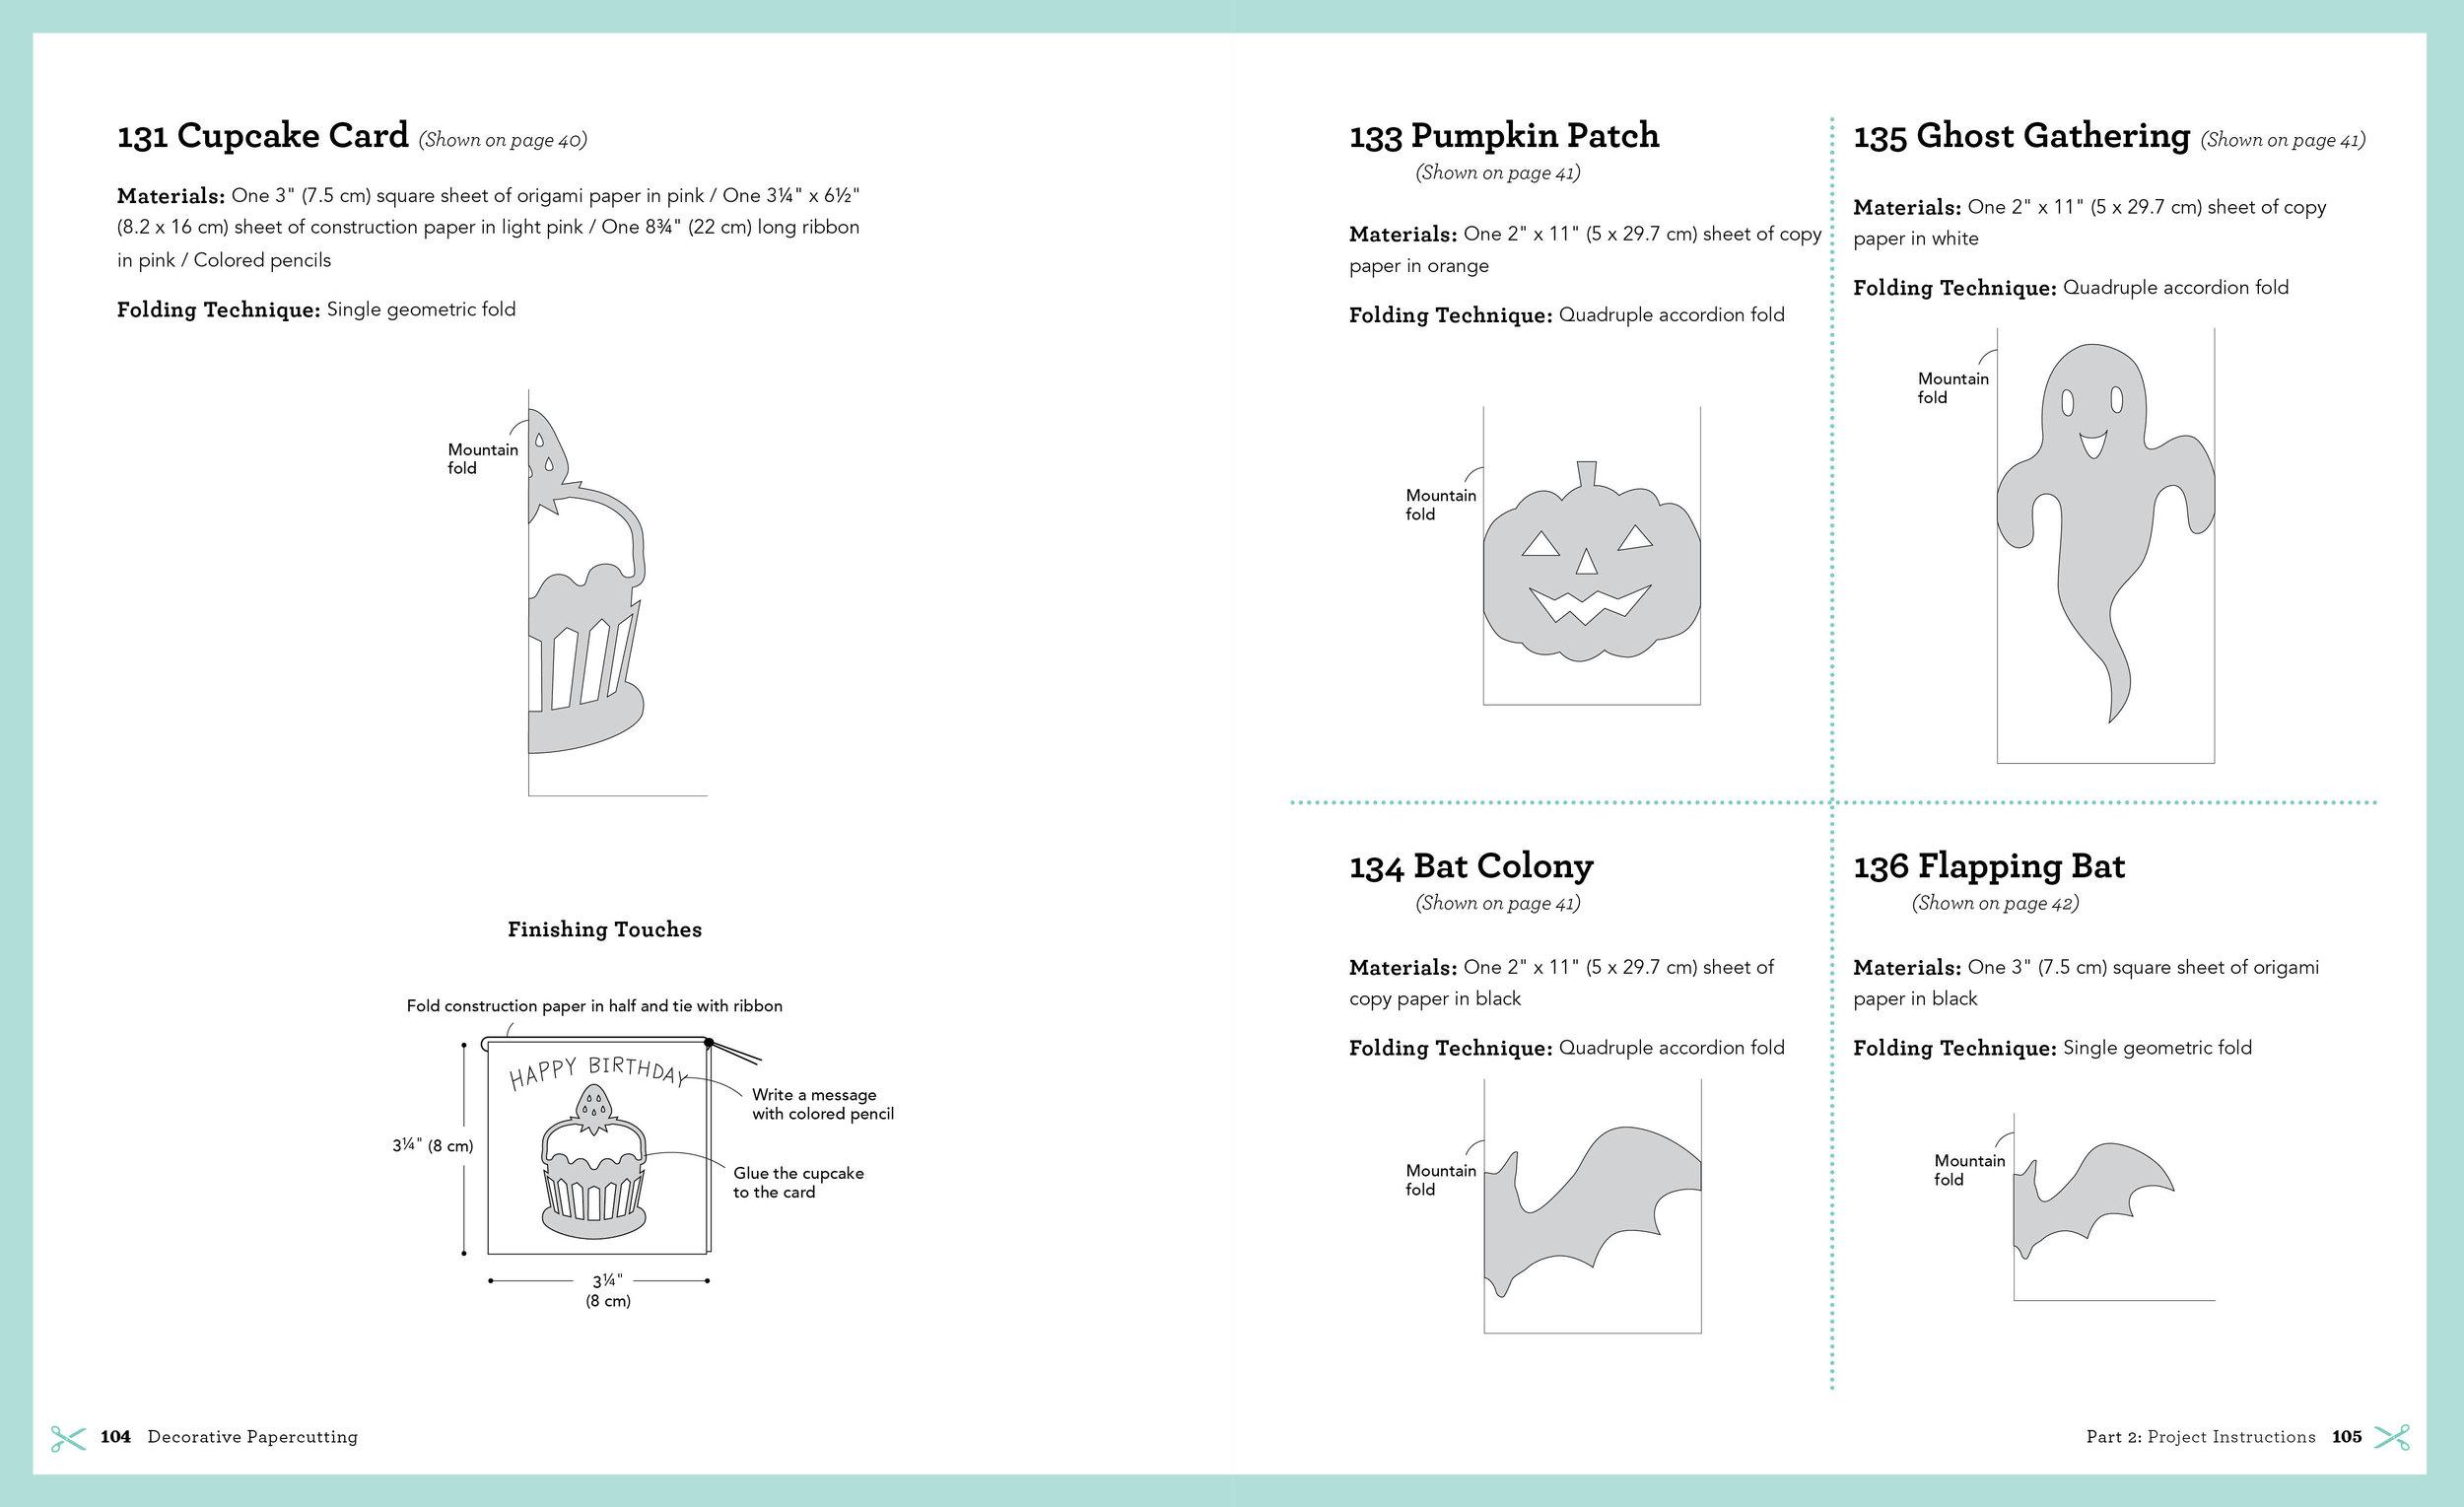 Decorative Papercutting 104.105.jpg